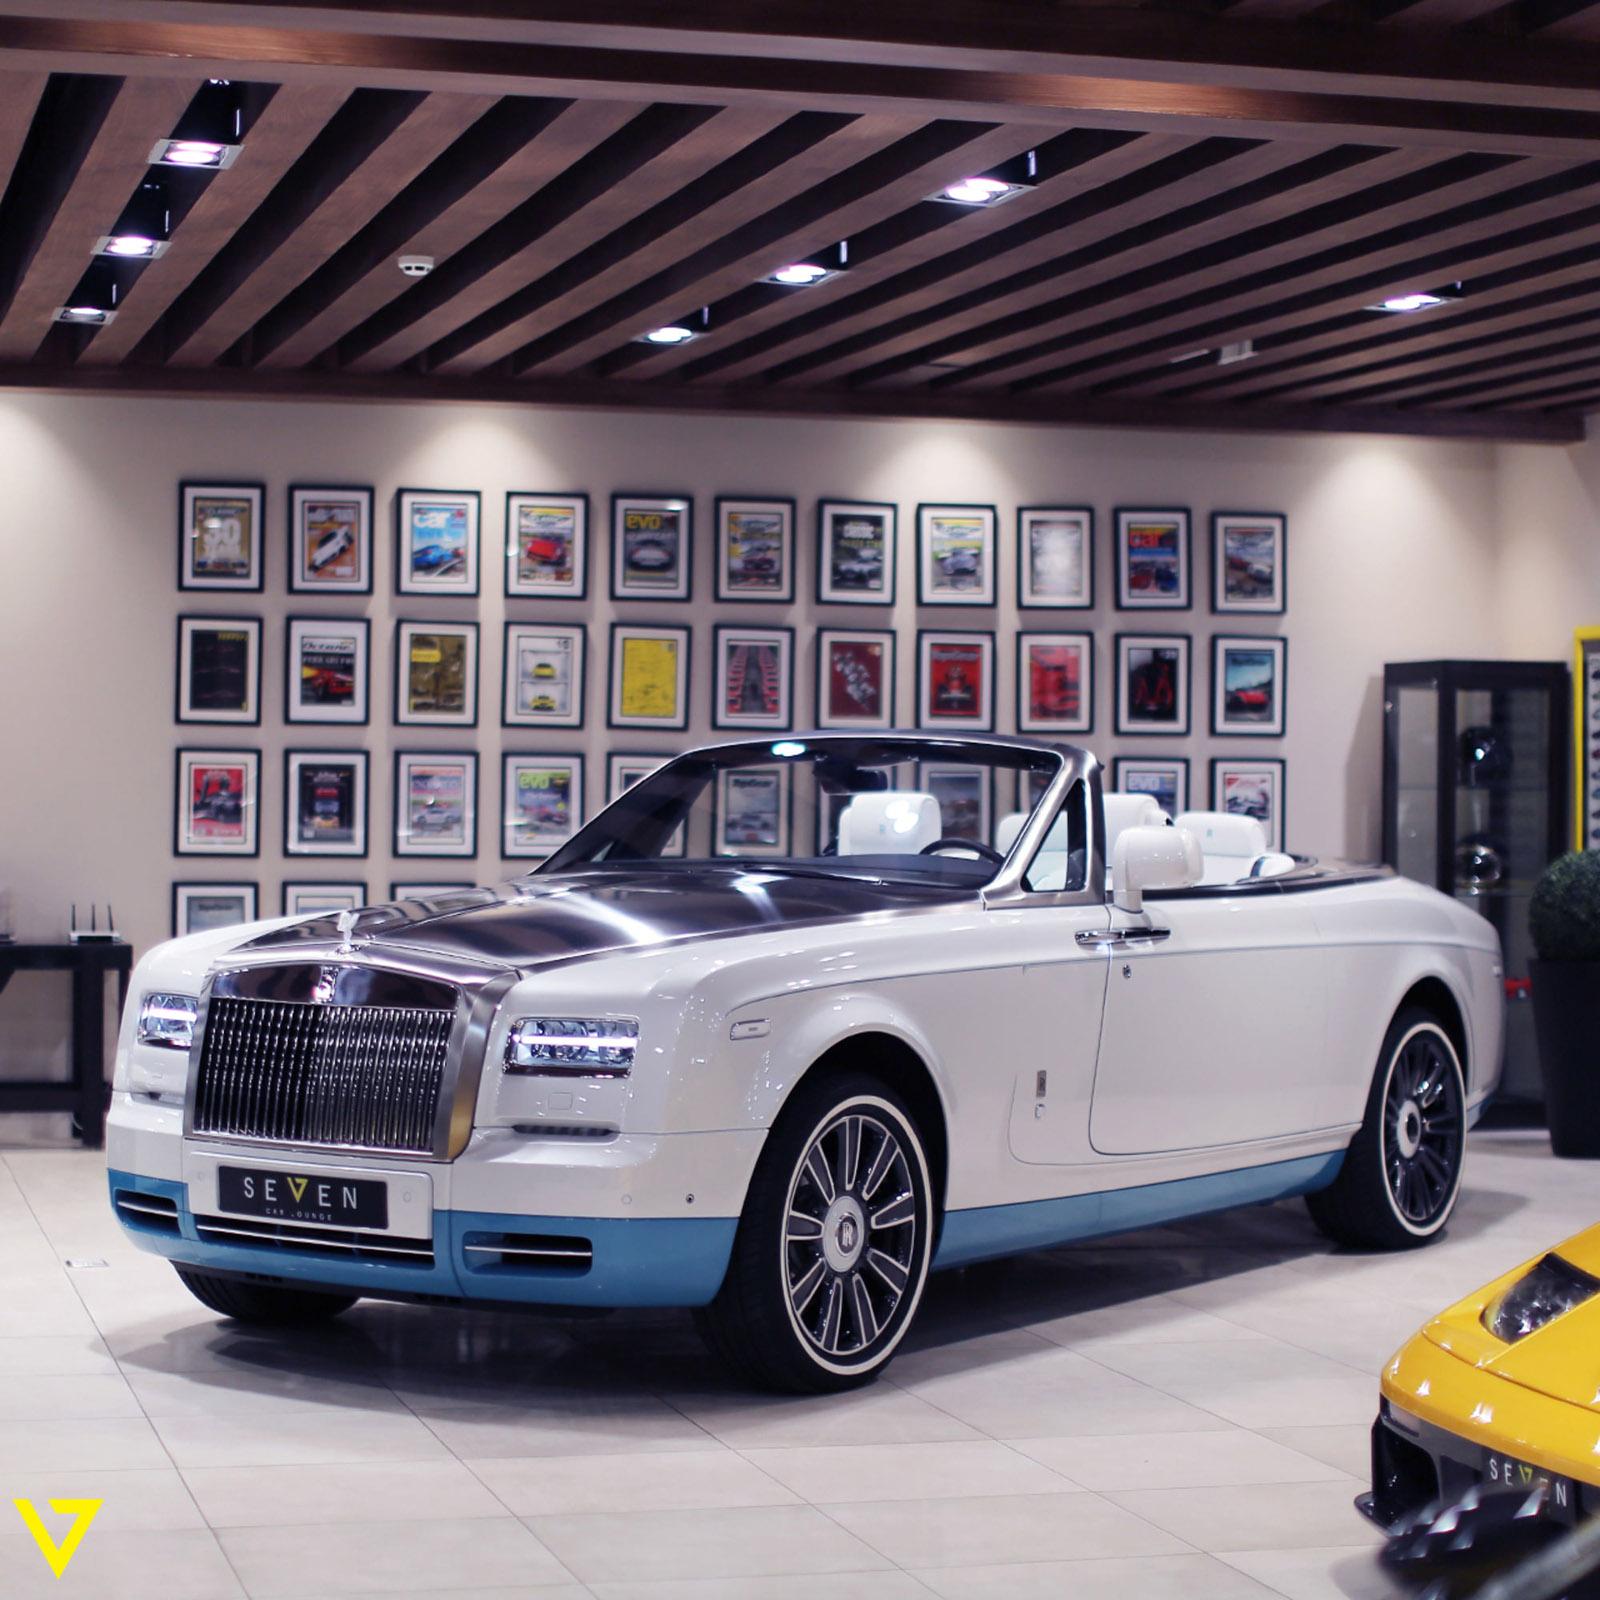 Rolls-Royce_Phantom_Drophead_Coupe_Last-of-Last_edition_01